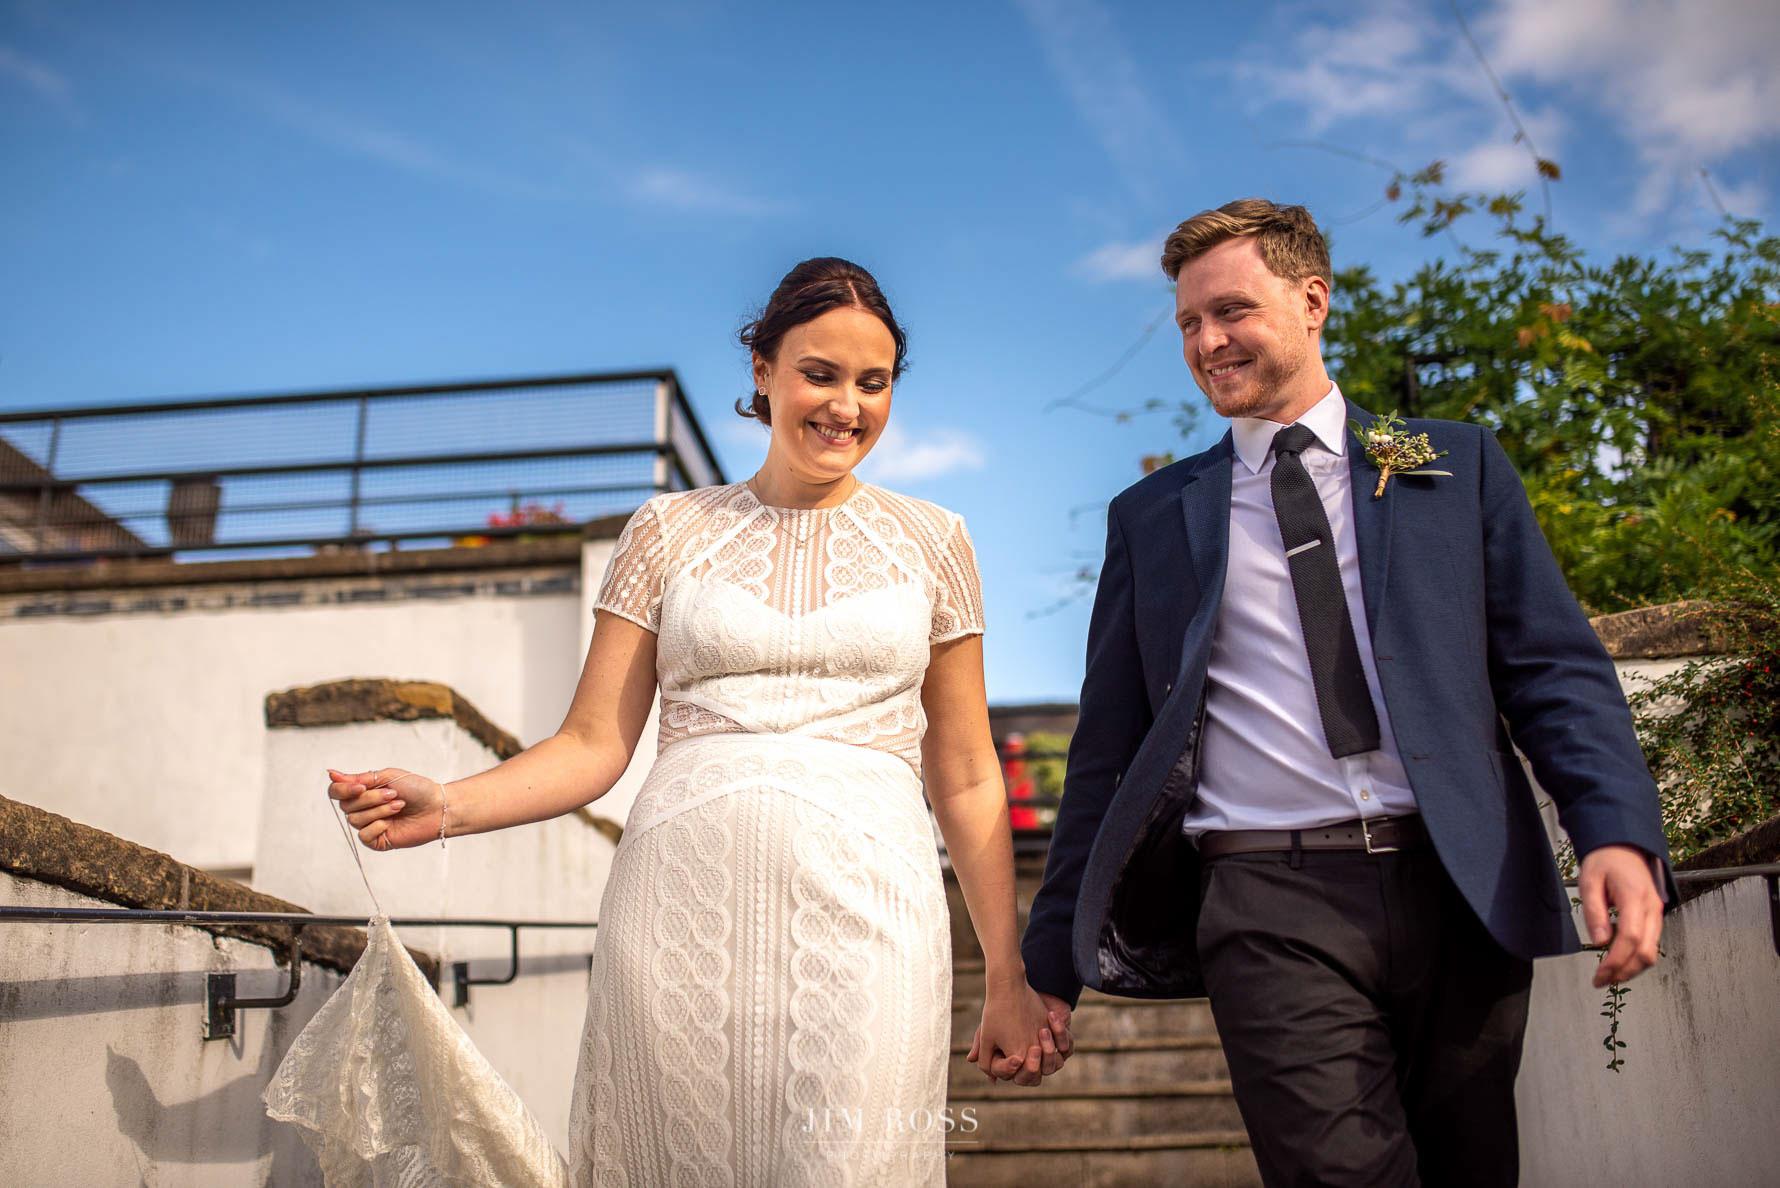 Newlyweds at Bella Vista Milnrow